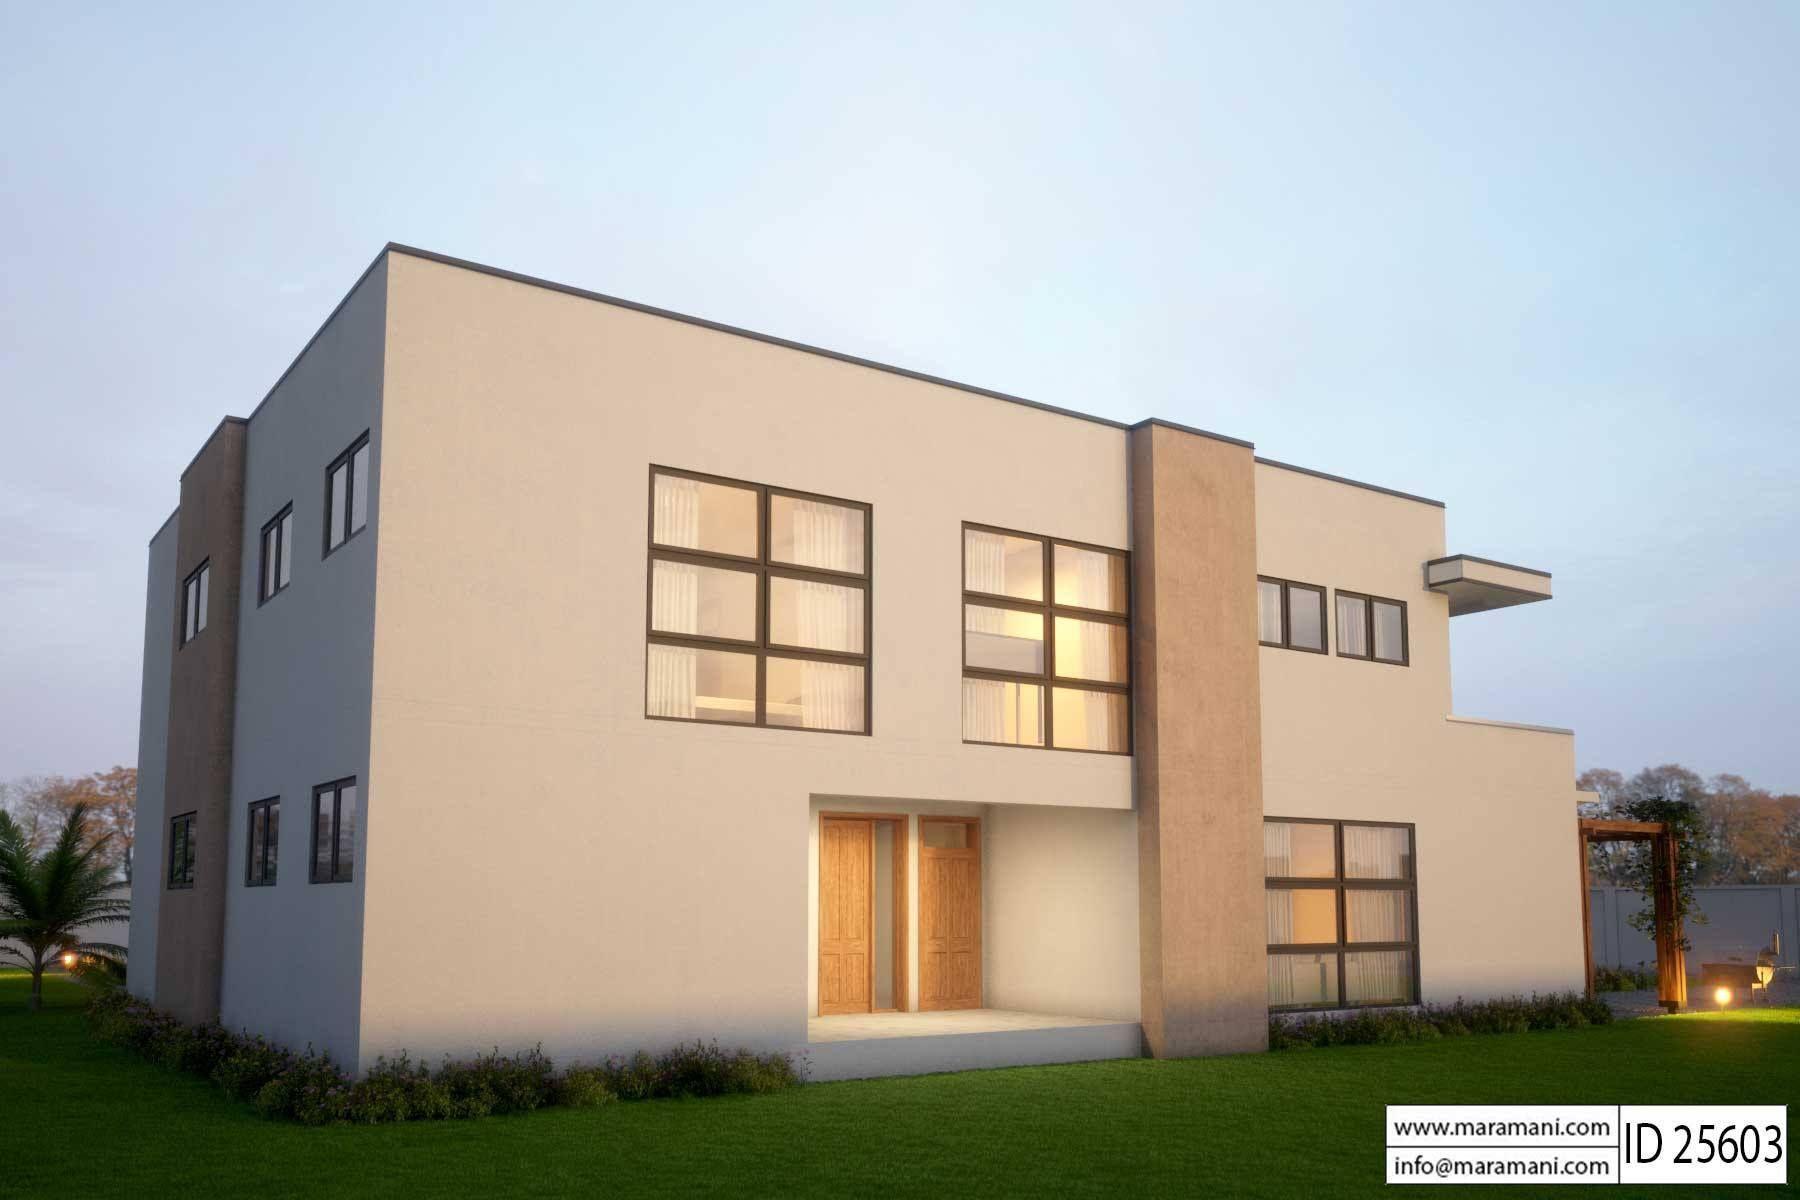 Modern 5 Bedroom House Design - ID 25603 - Floor Plans in ...